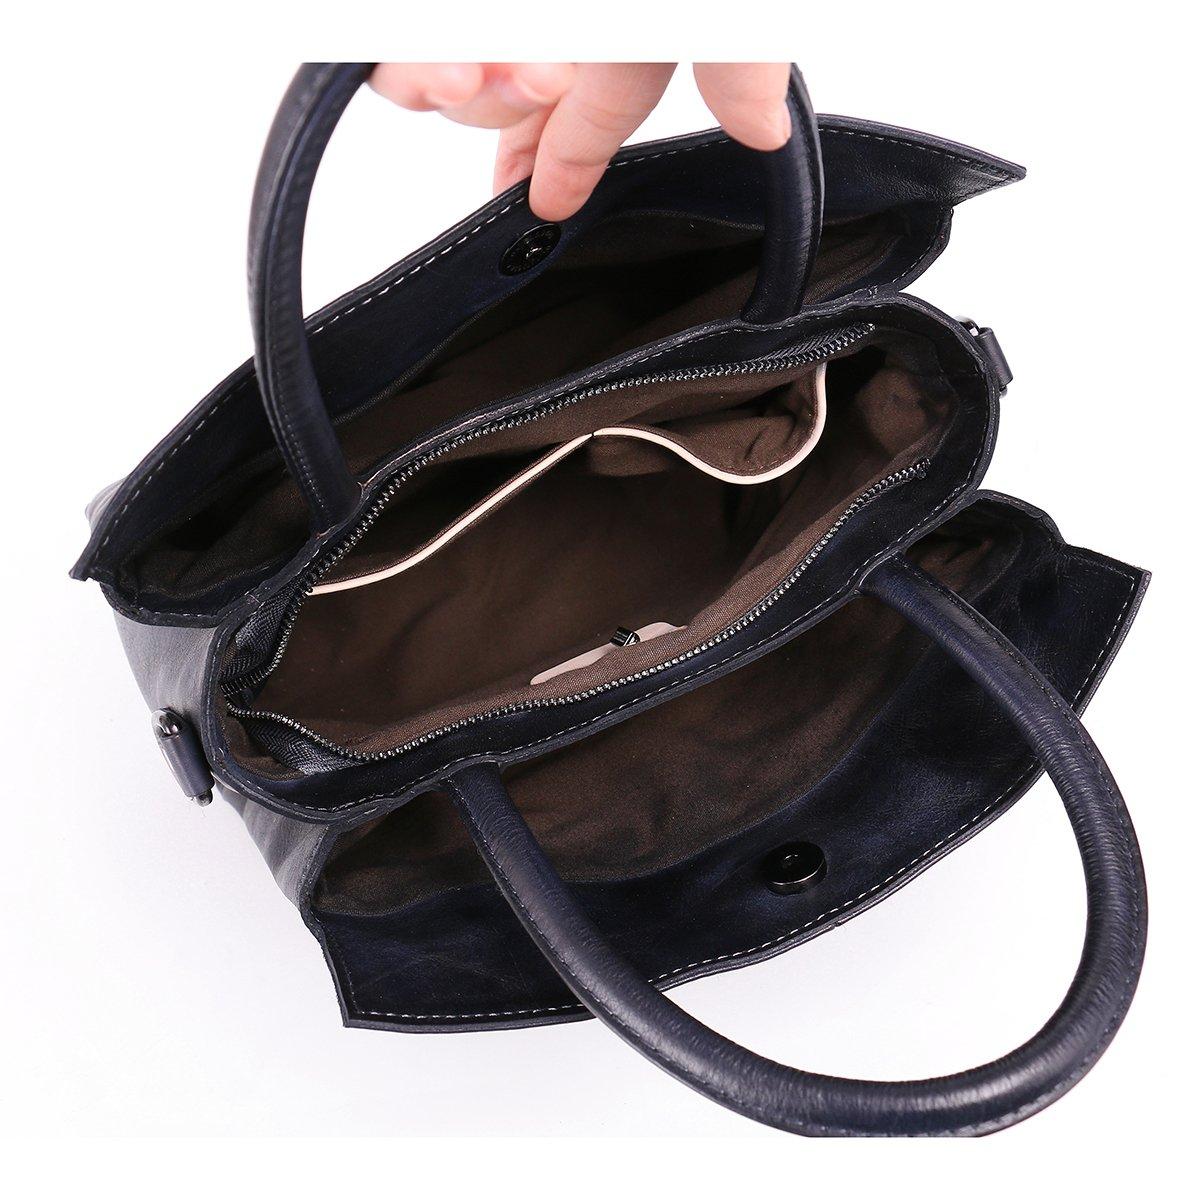 Aphison Designer Soft Leather Totes Handbags for Women, Ladies Satchels Shoulder Bags (BLACK) by APHISON (Image #6)